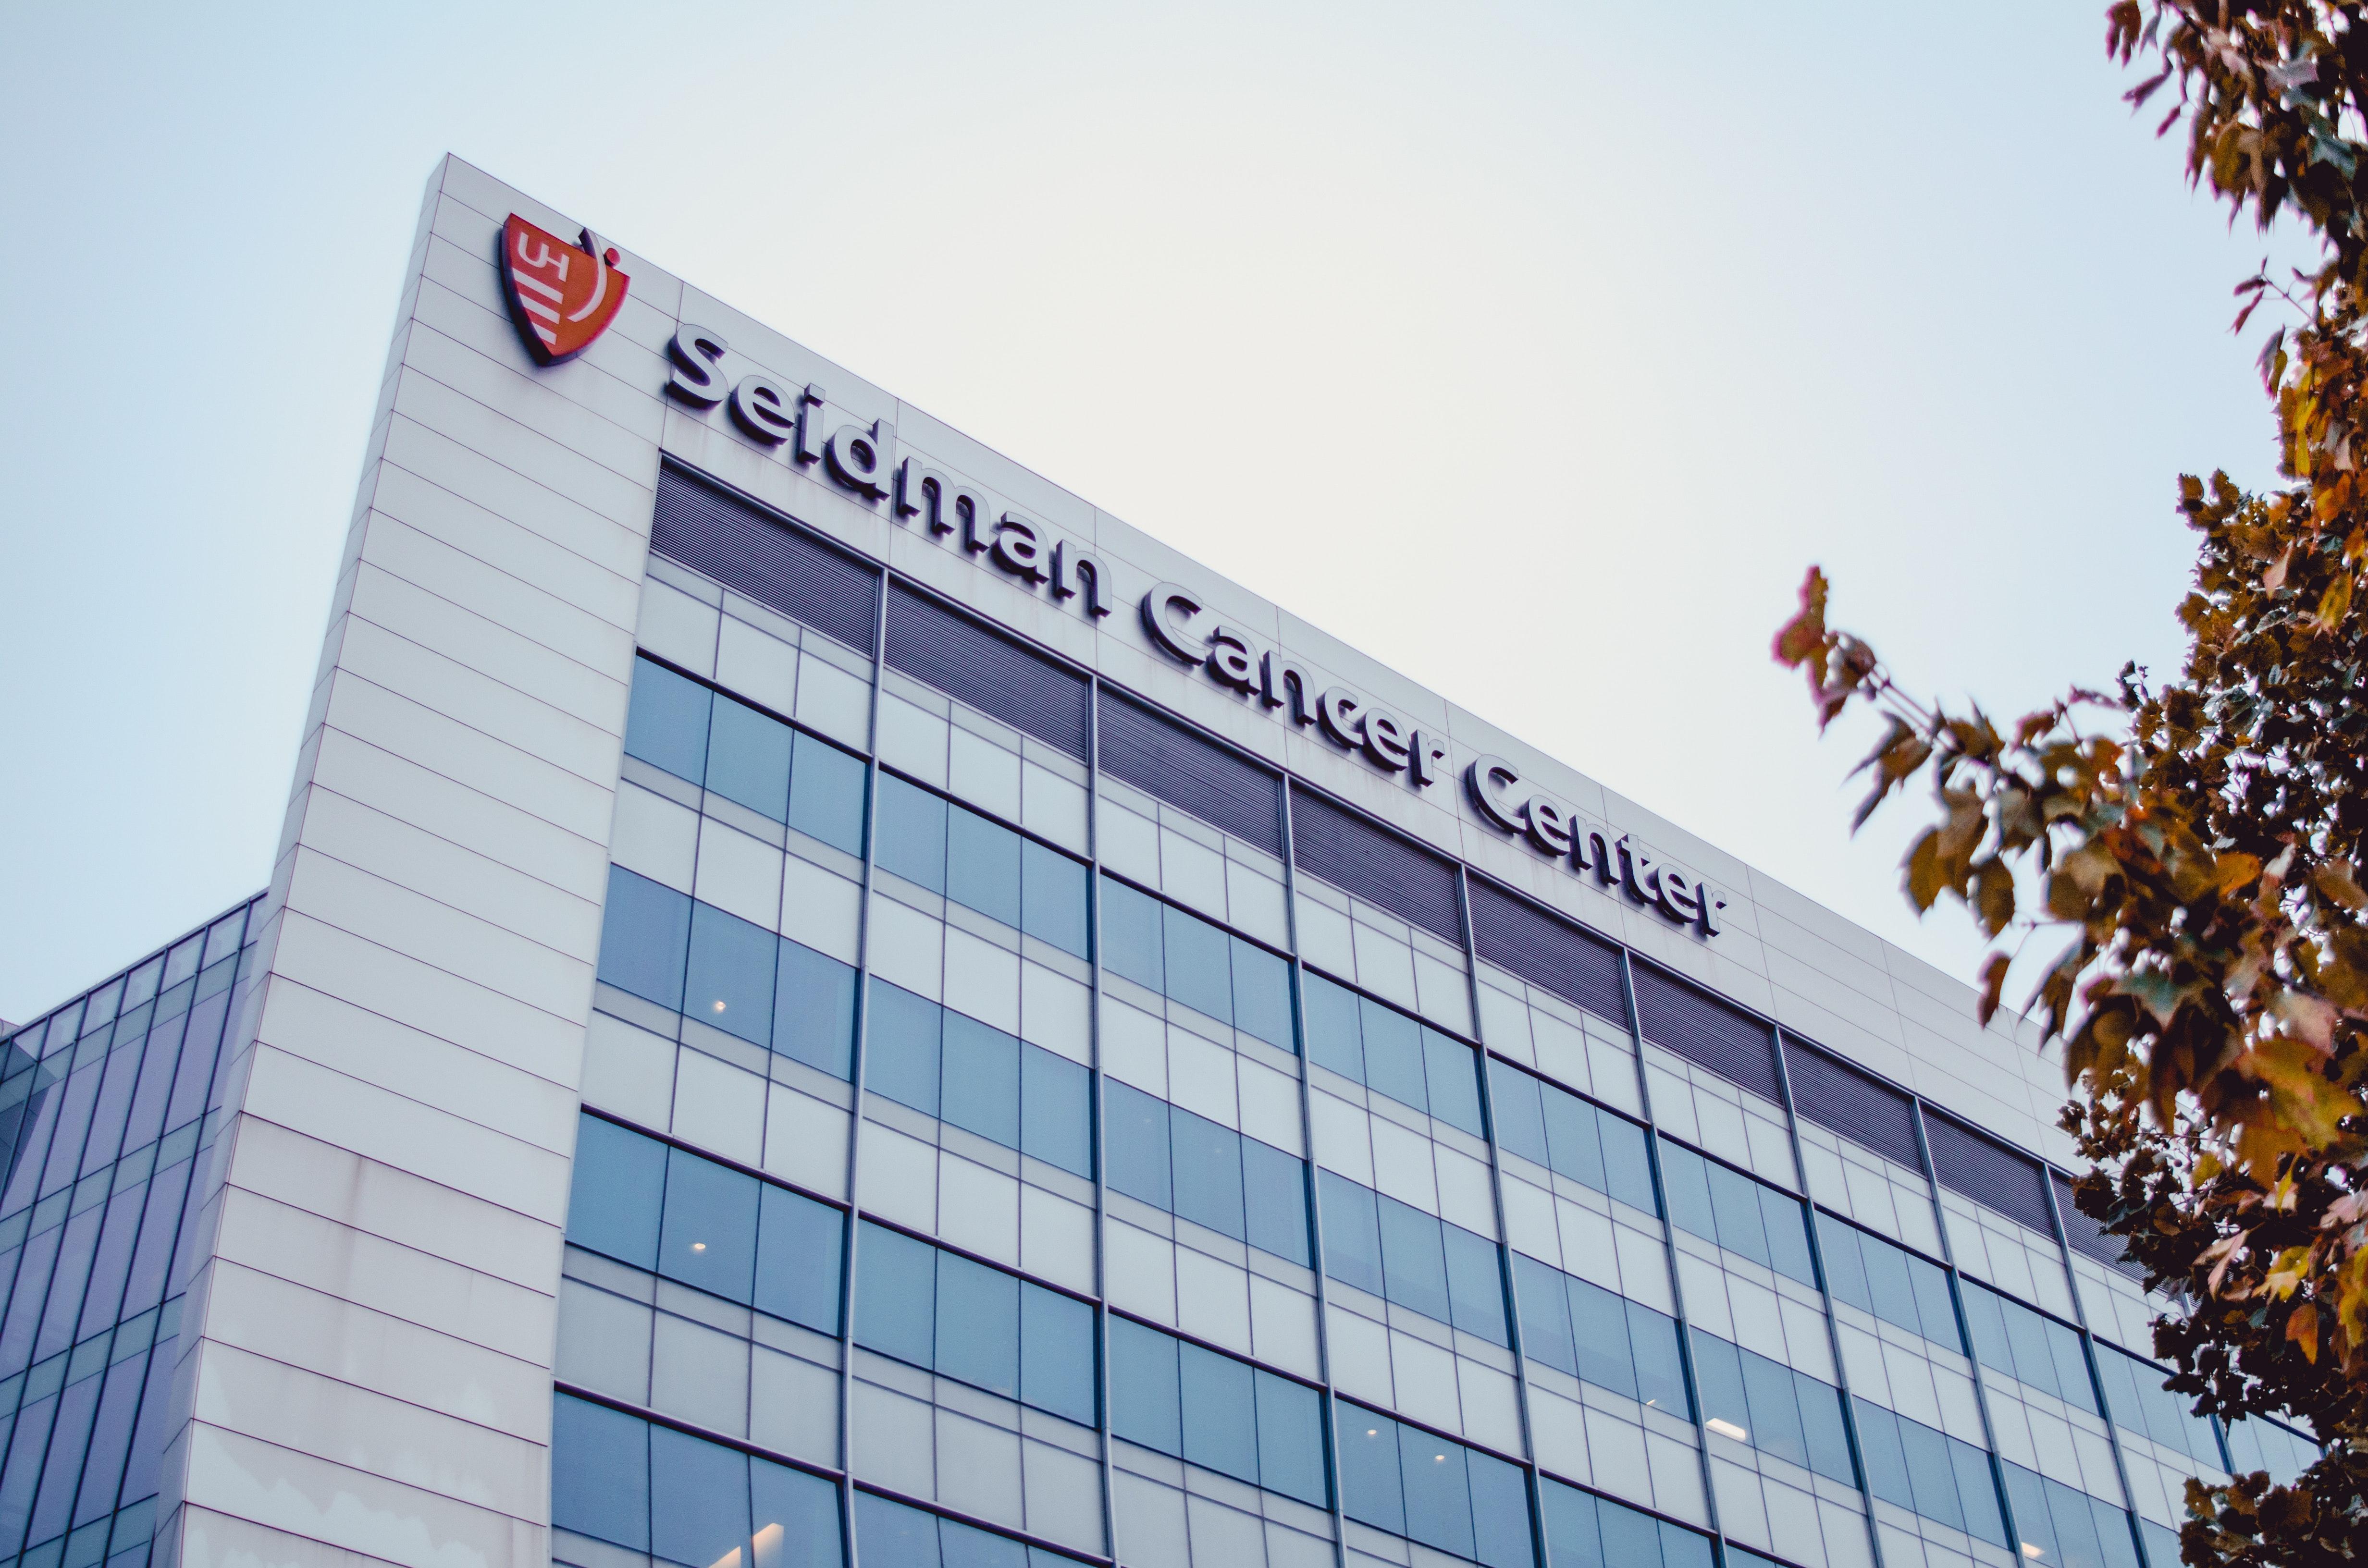 Seidman Cancer Center Building at Daytime, Architectural design, Glass windows, Tallest, Skyscraper, HQ Photo